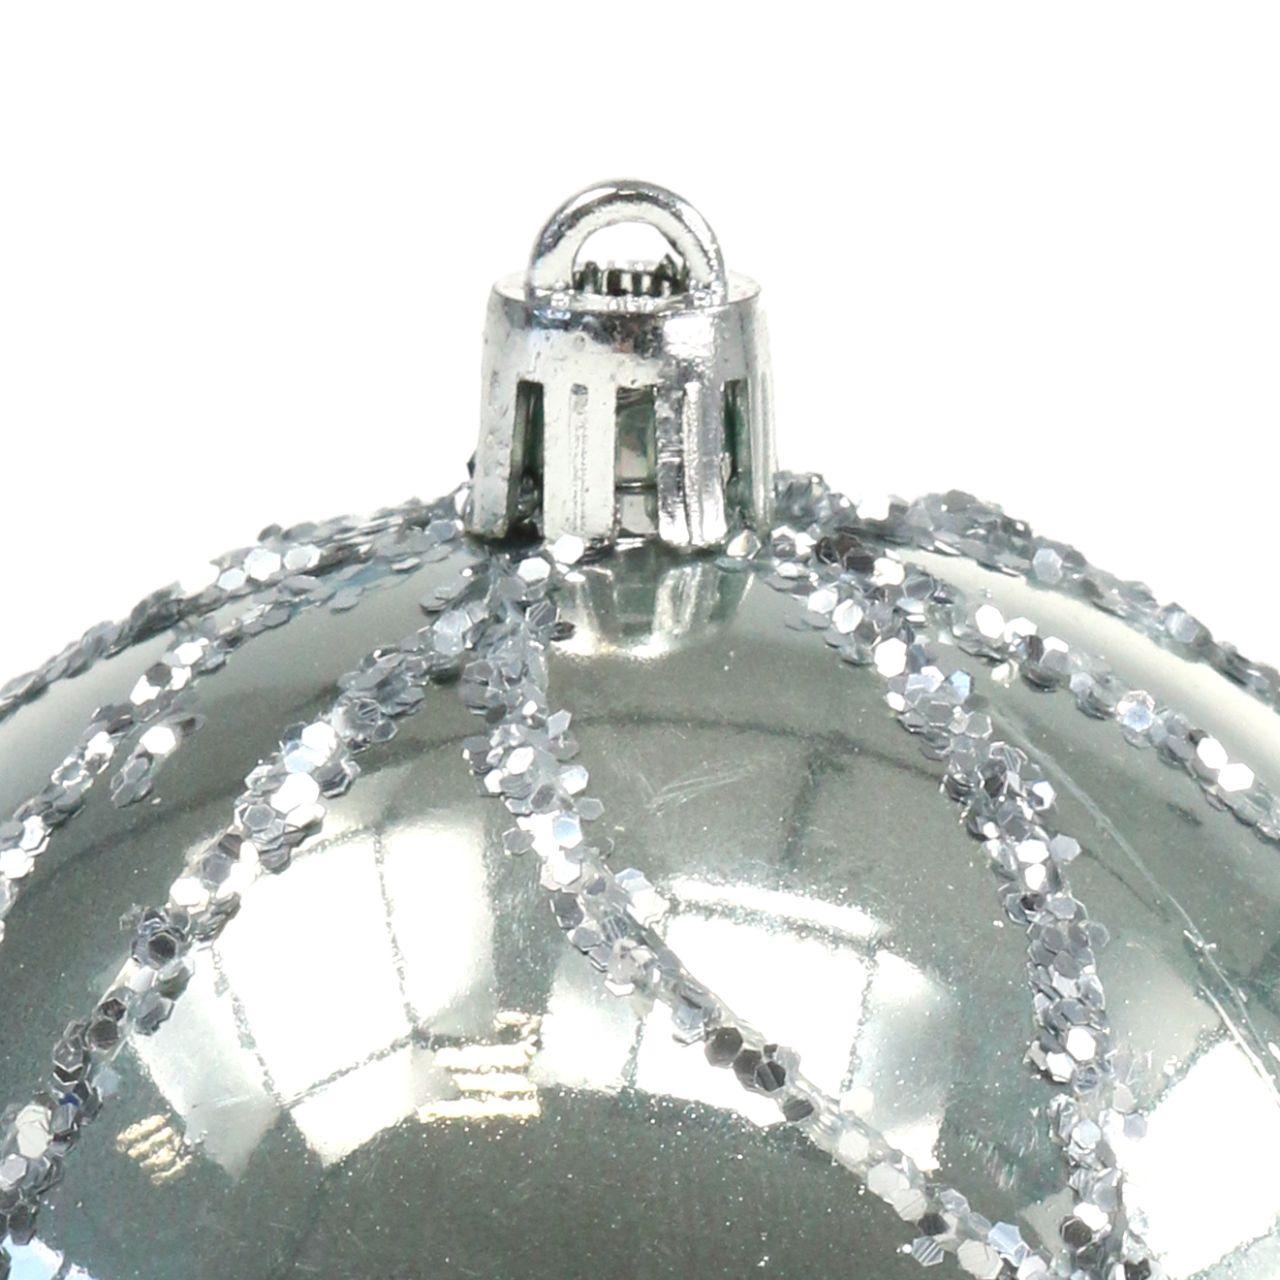 Weihnachtskugel Plastik Silber Ø8cm 2St